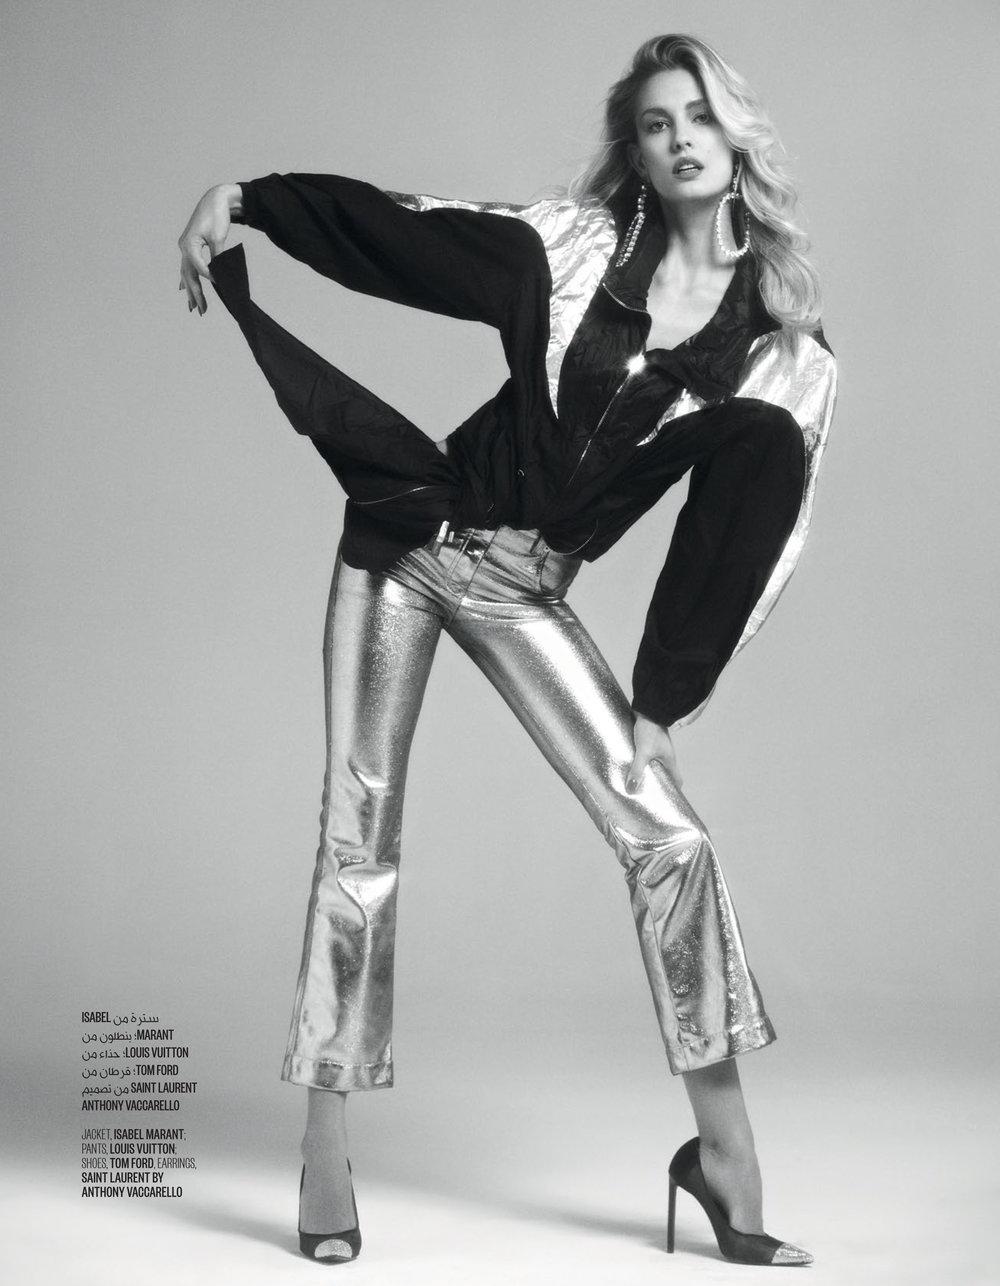 16 Vogue Arabia Jul_Aug 18 Final Binder_Magzer (dragged)-1-4.jpg